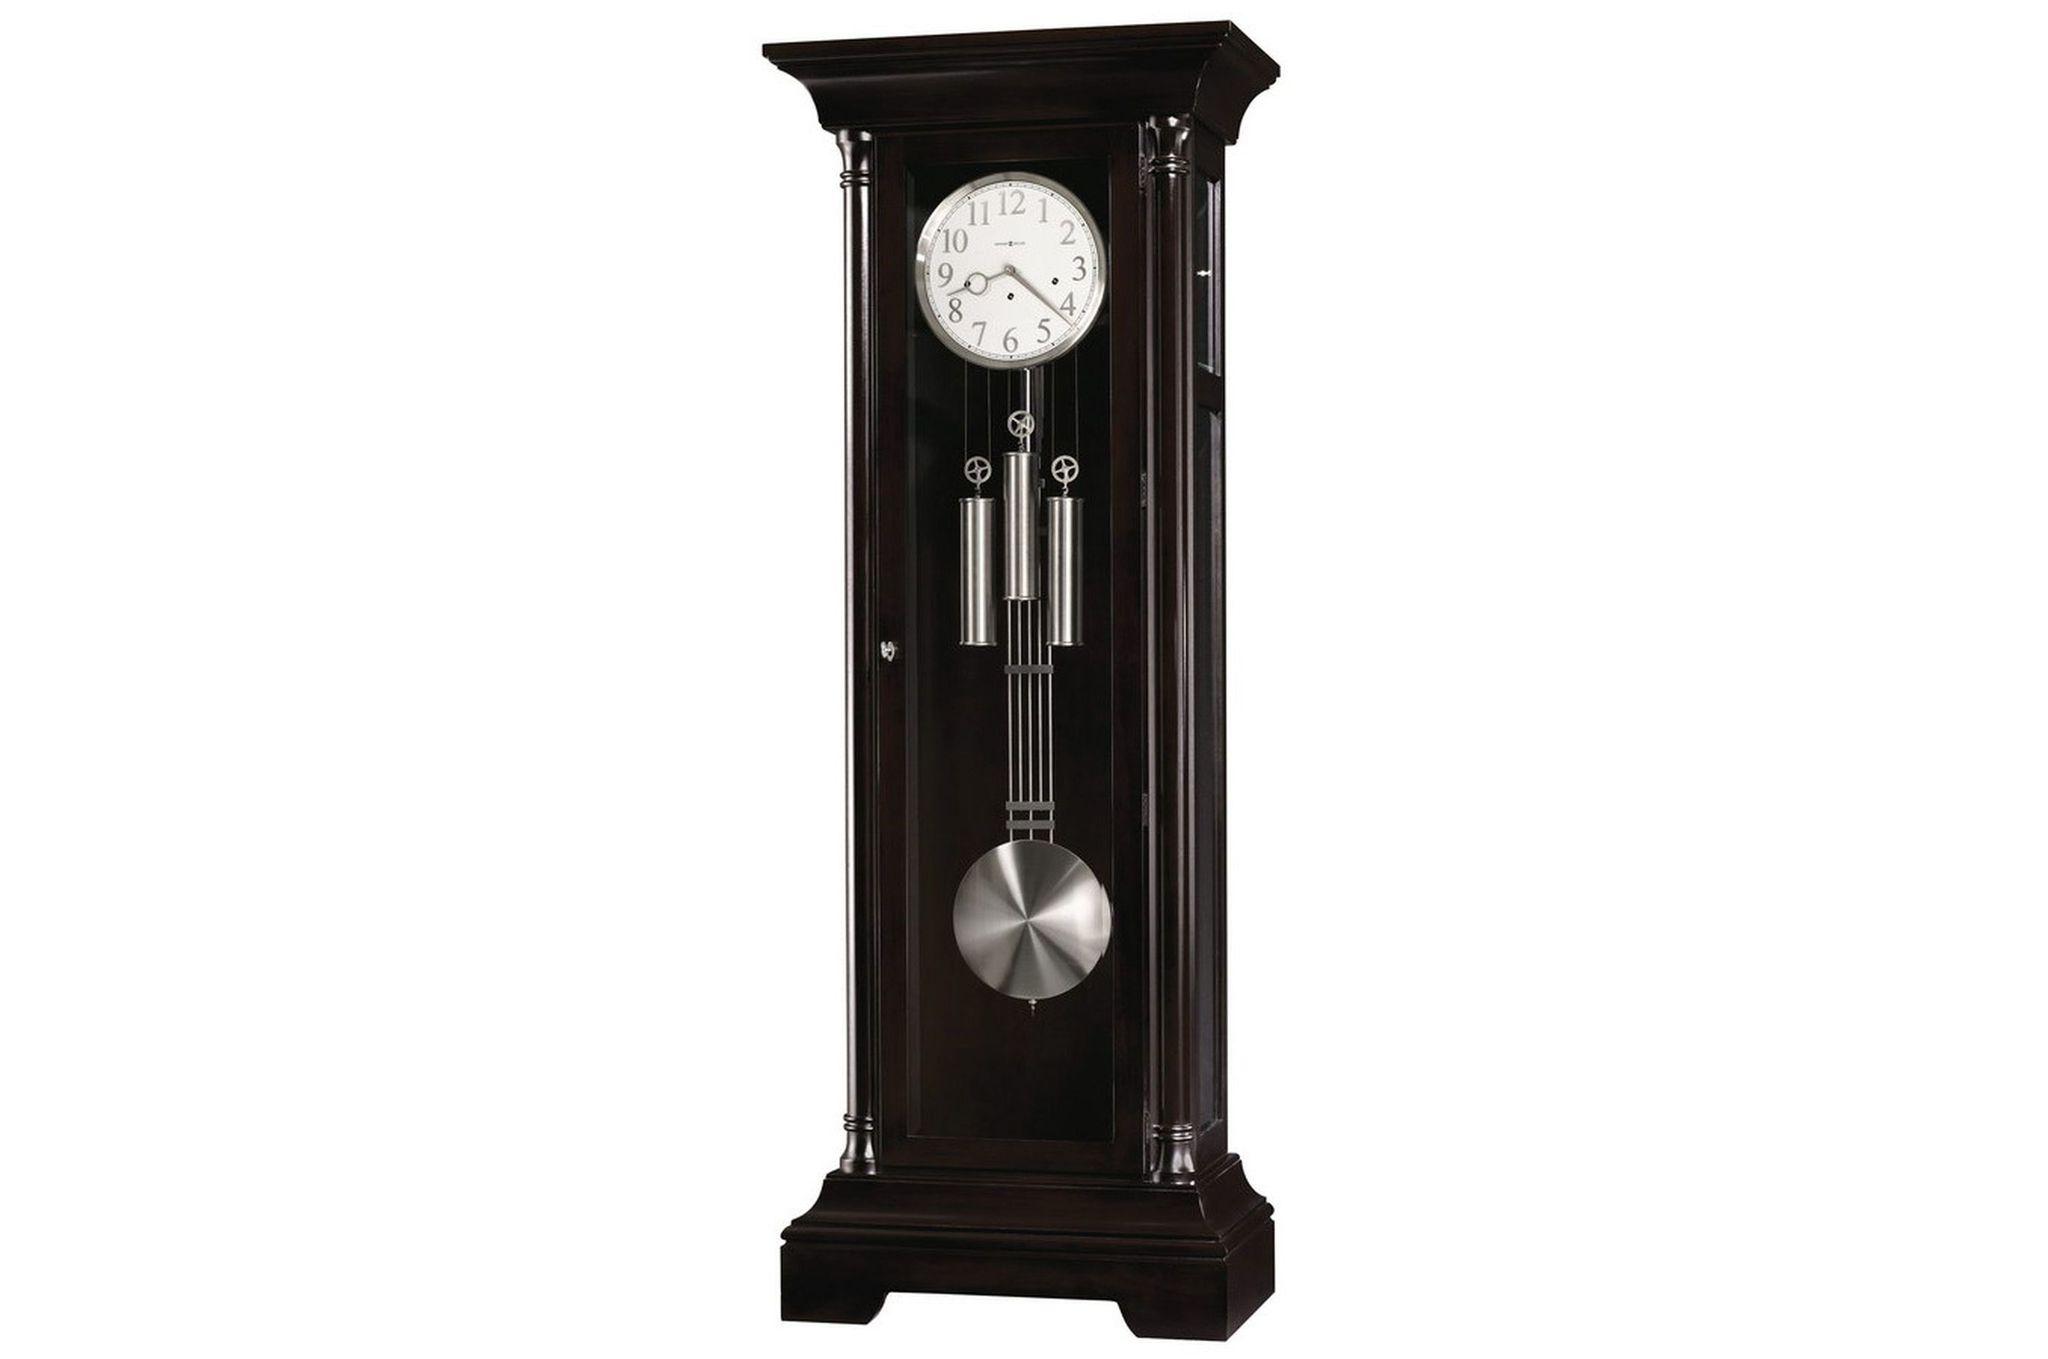 Часы напольные Часы напольные Howard Miller 611-032 Seville chasy-napolnye-howard-miller-611-032-ssha.jpg